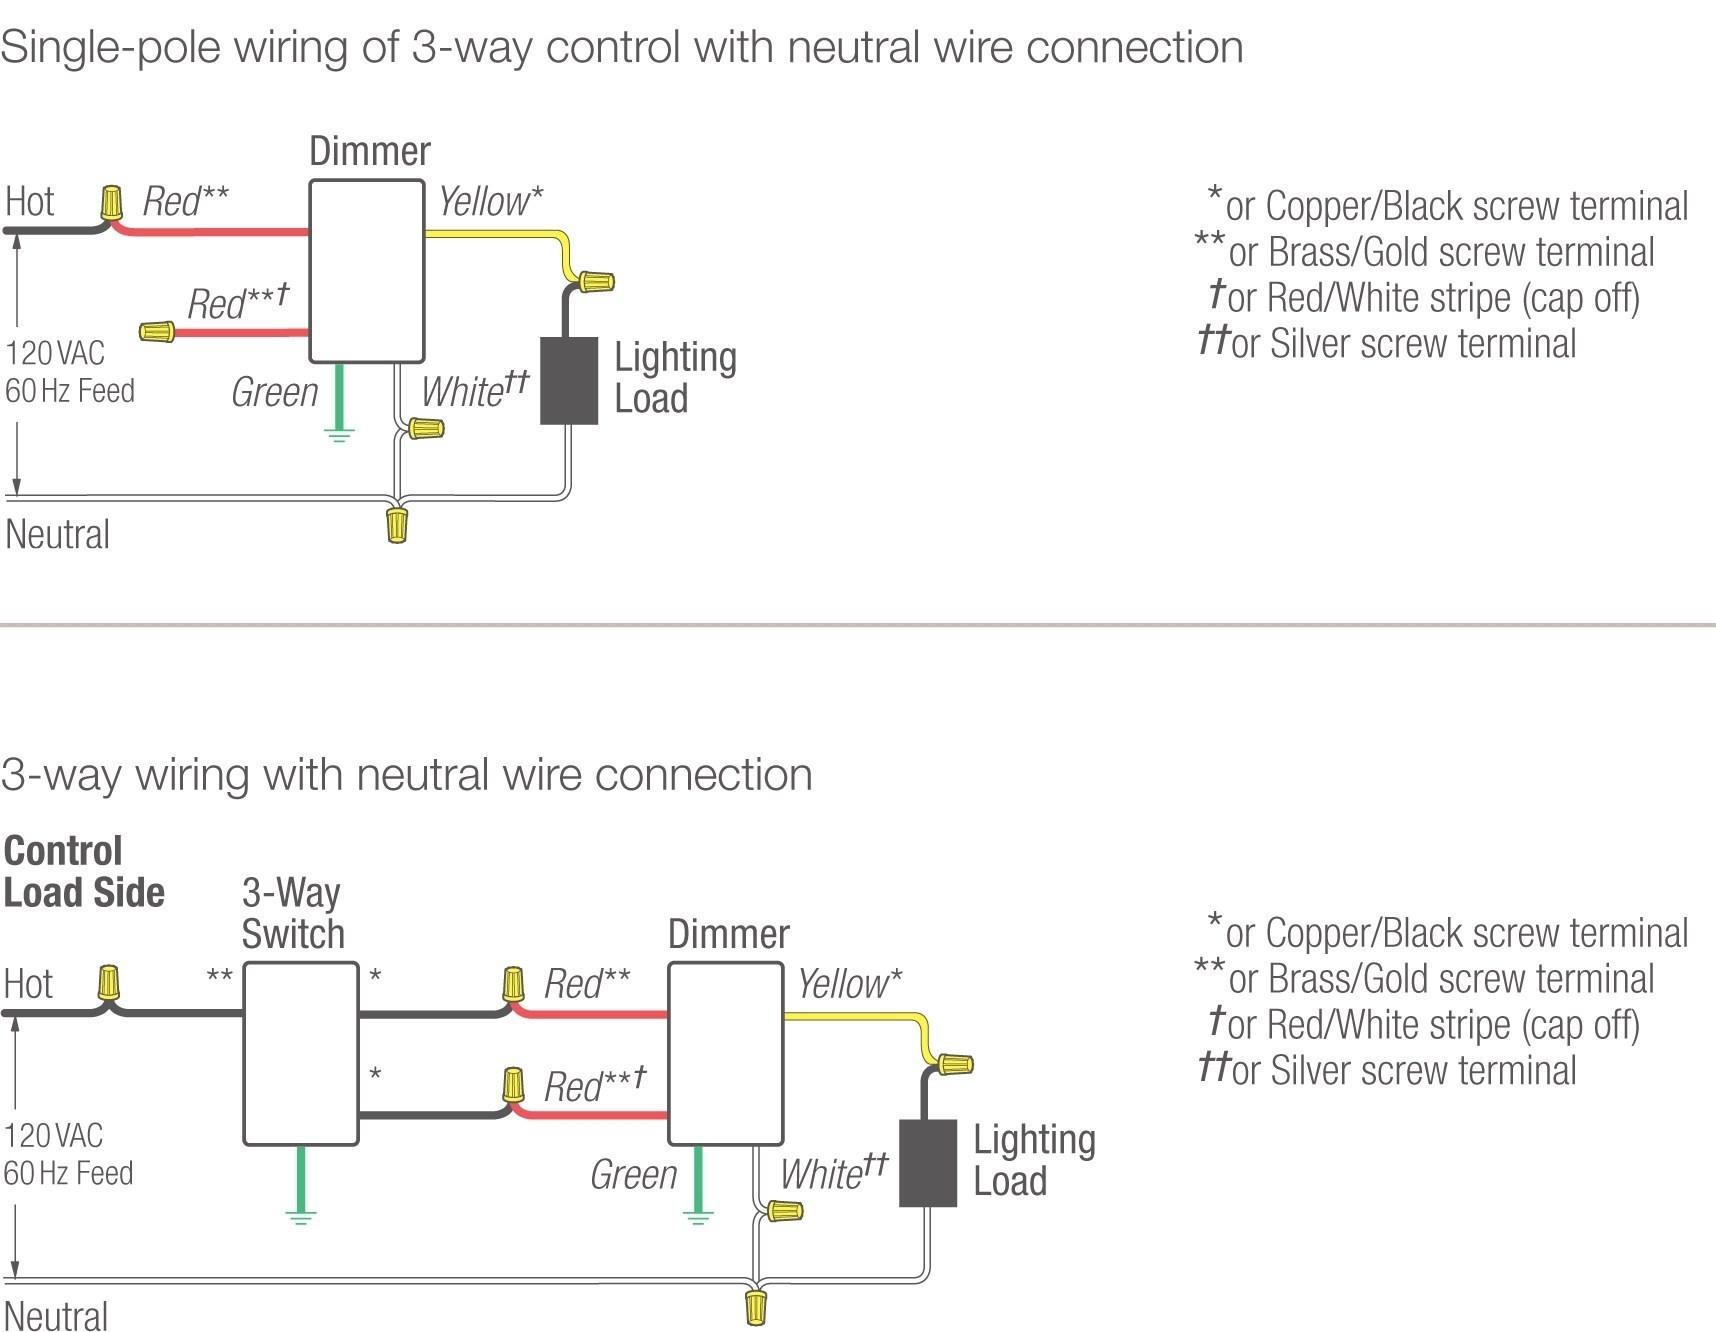 lutron maestro 3 way dimmer wiring diagram wiring diagram image rh mainetreasurechest com Lutron Dimming Ballast Wiring Diagram Lutron 3-Way Wiring Diagram